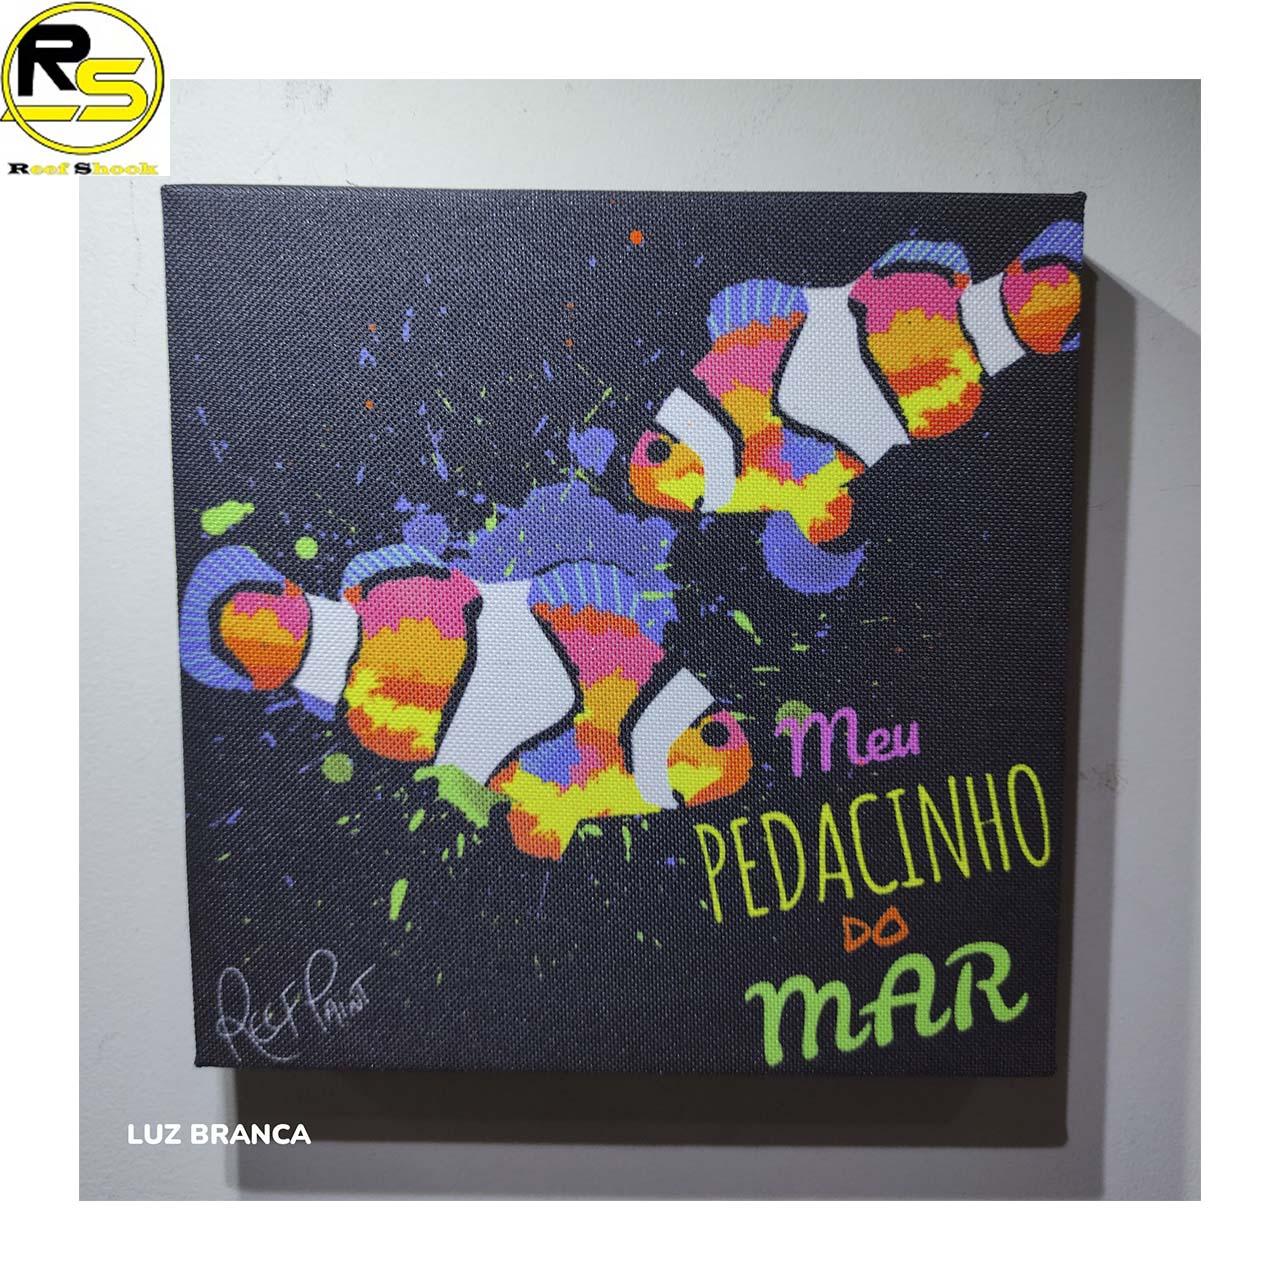 Quadro ReefPaint com tinta Neon 1114 Artístico Ocellaris com frase